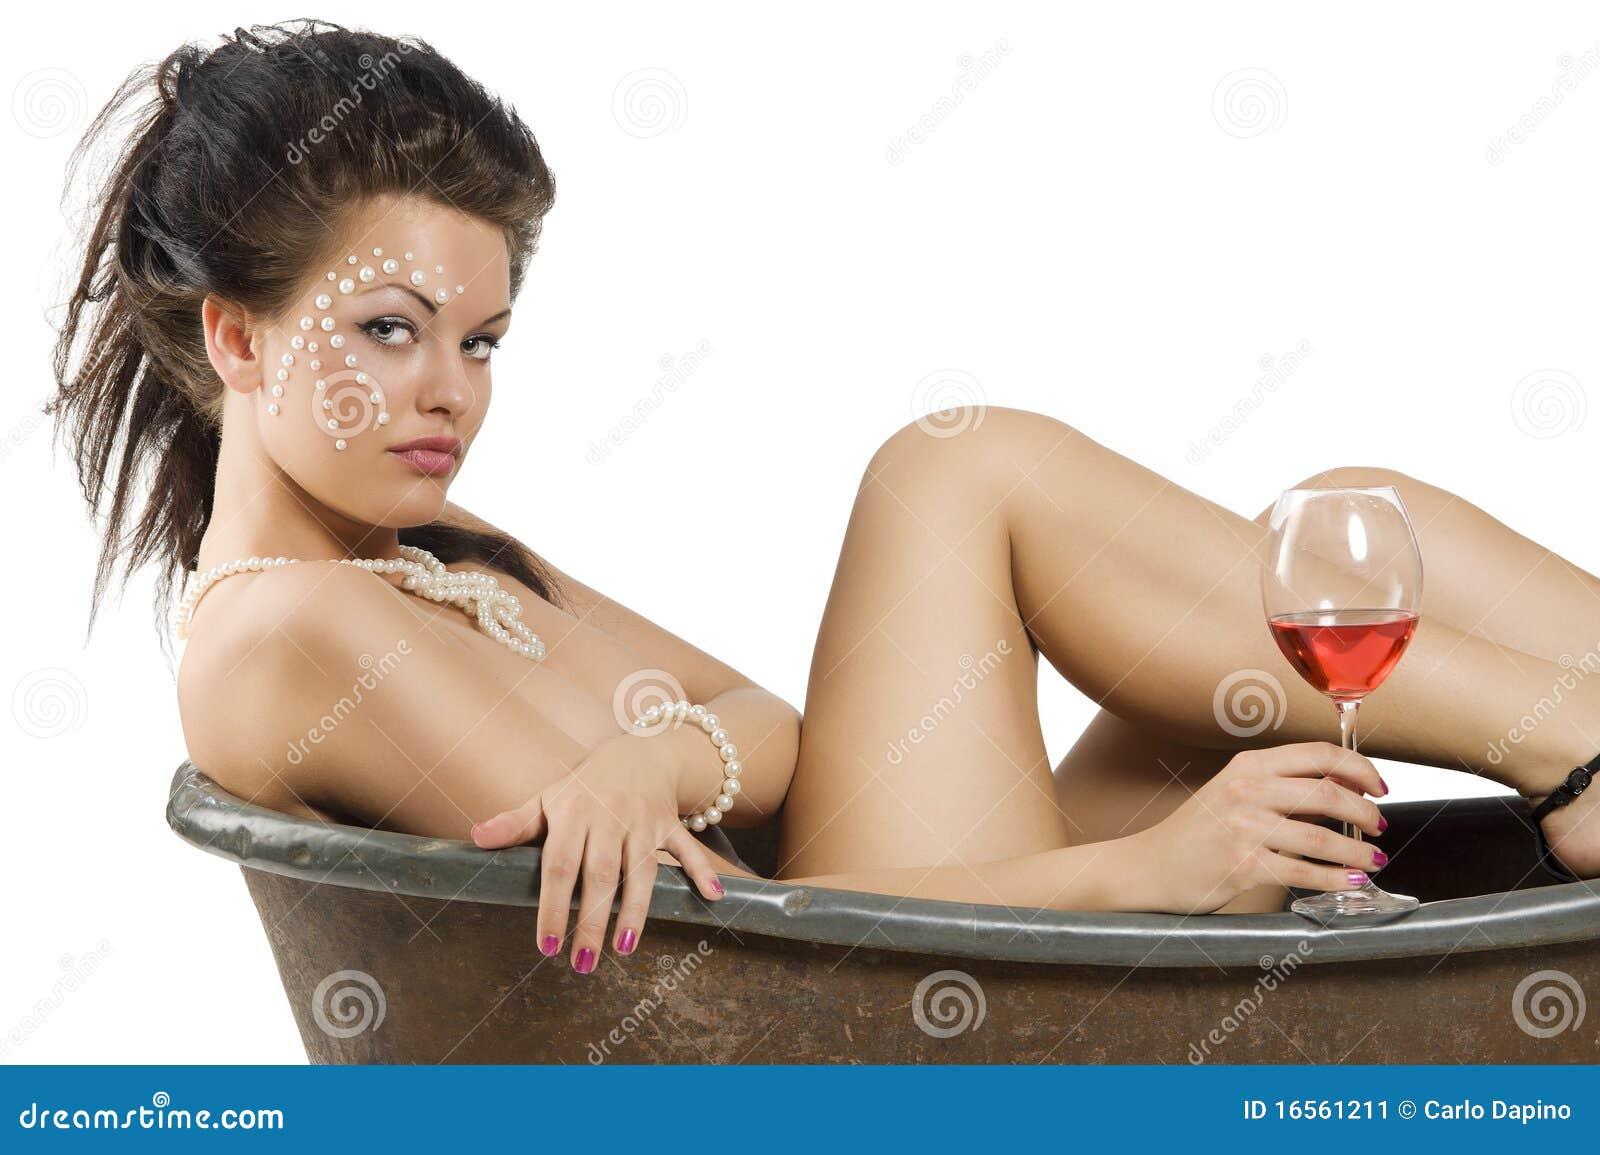 zasveti-devushek-podsmatrivaemie-nyu-devushka-odna-na-troih-v-grubom-sekse